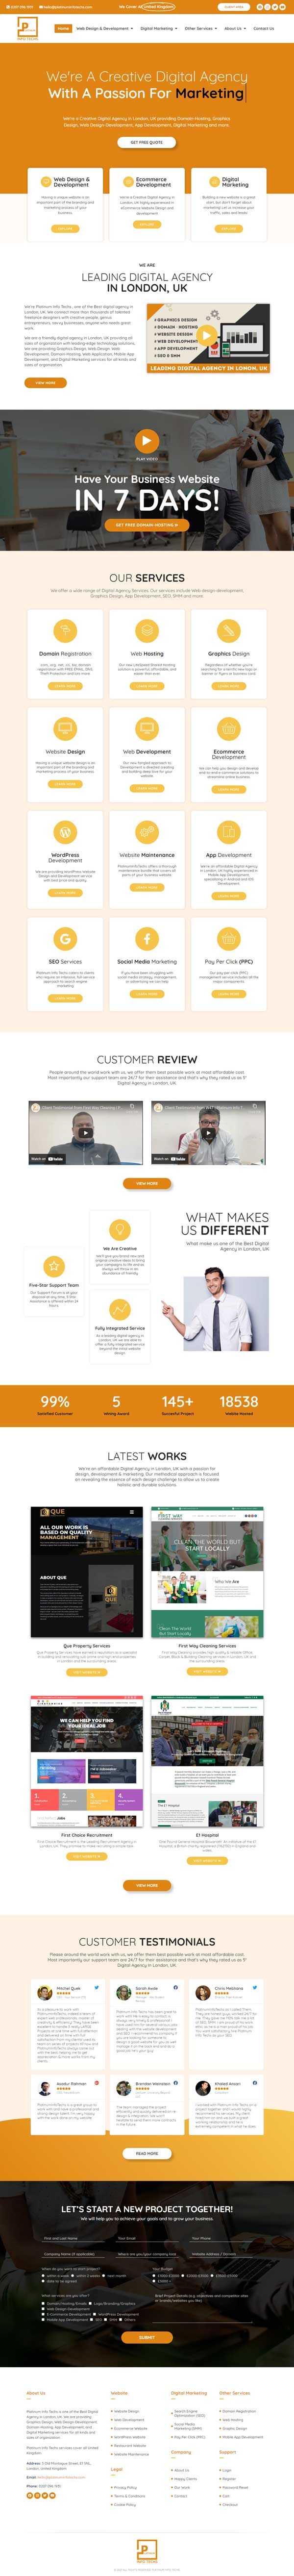 Home Platinum Info Techs WPBigBang - WP BigBang